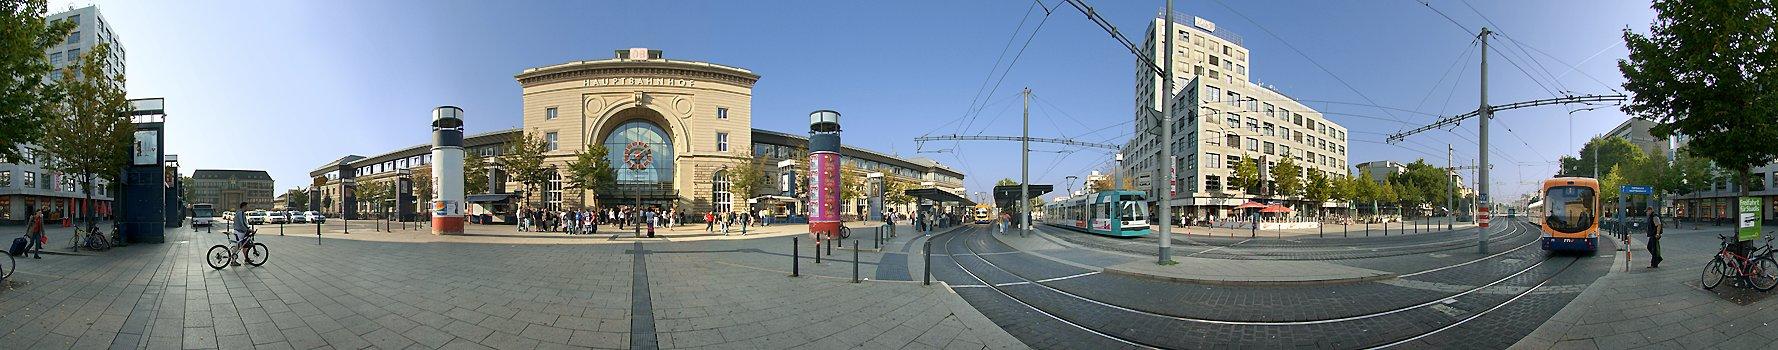 Central Station Mannheim Germany